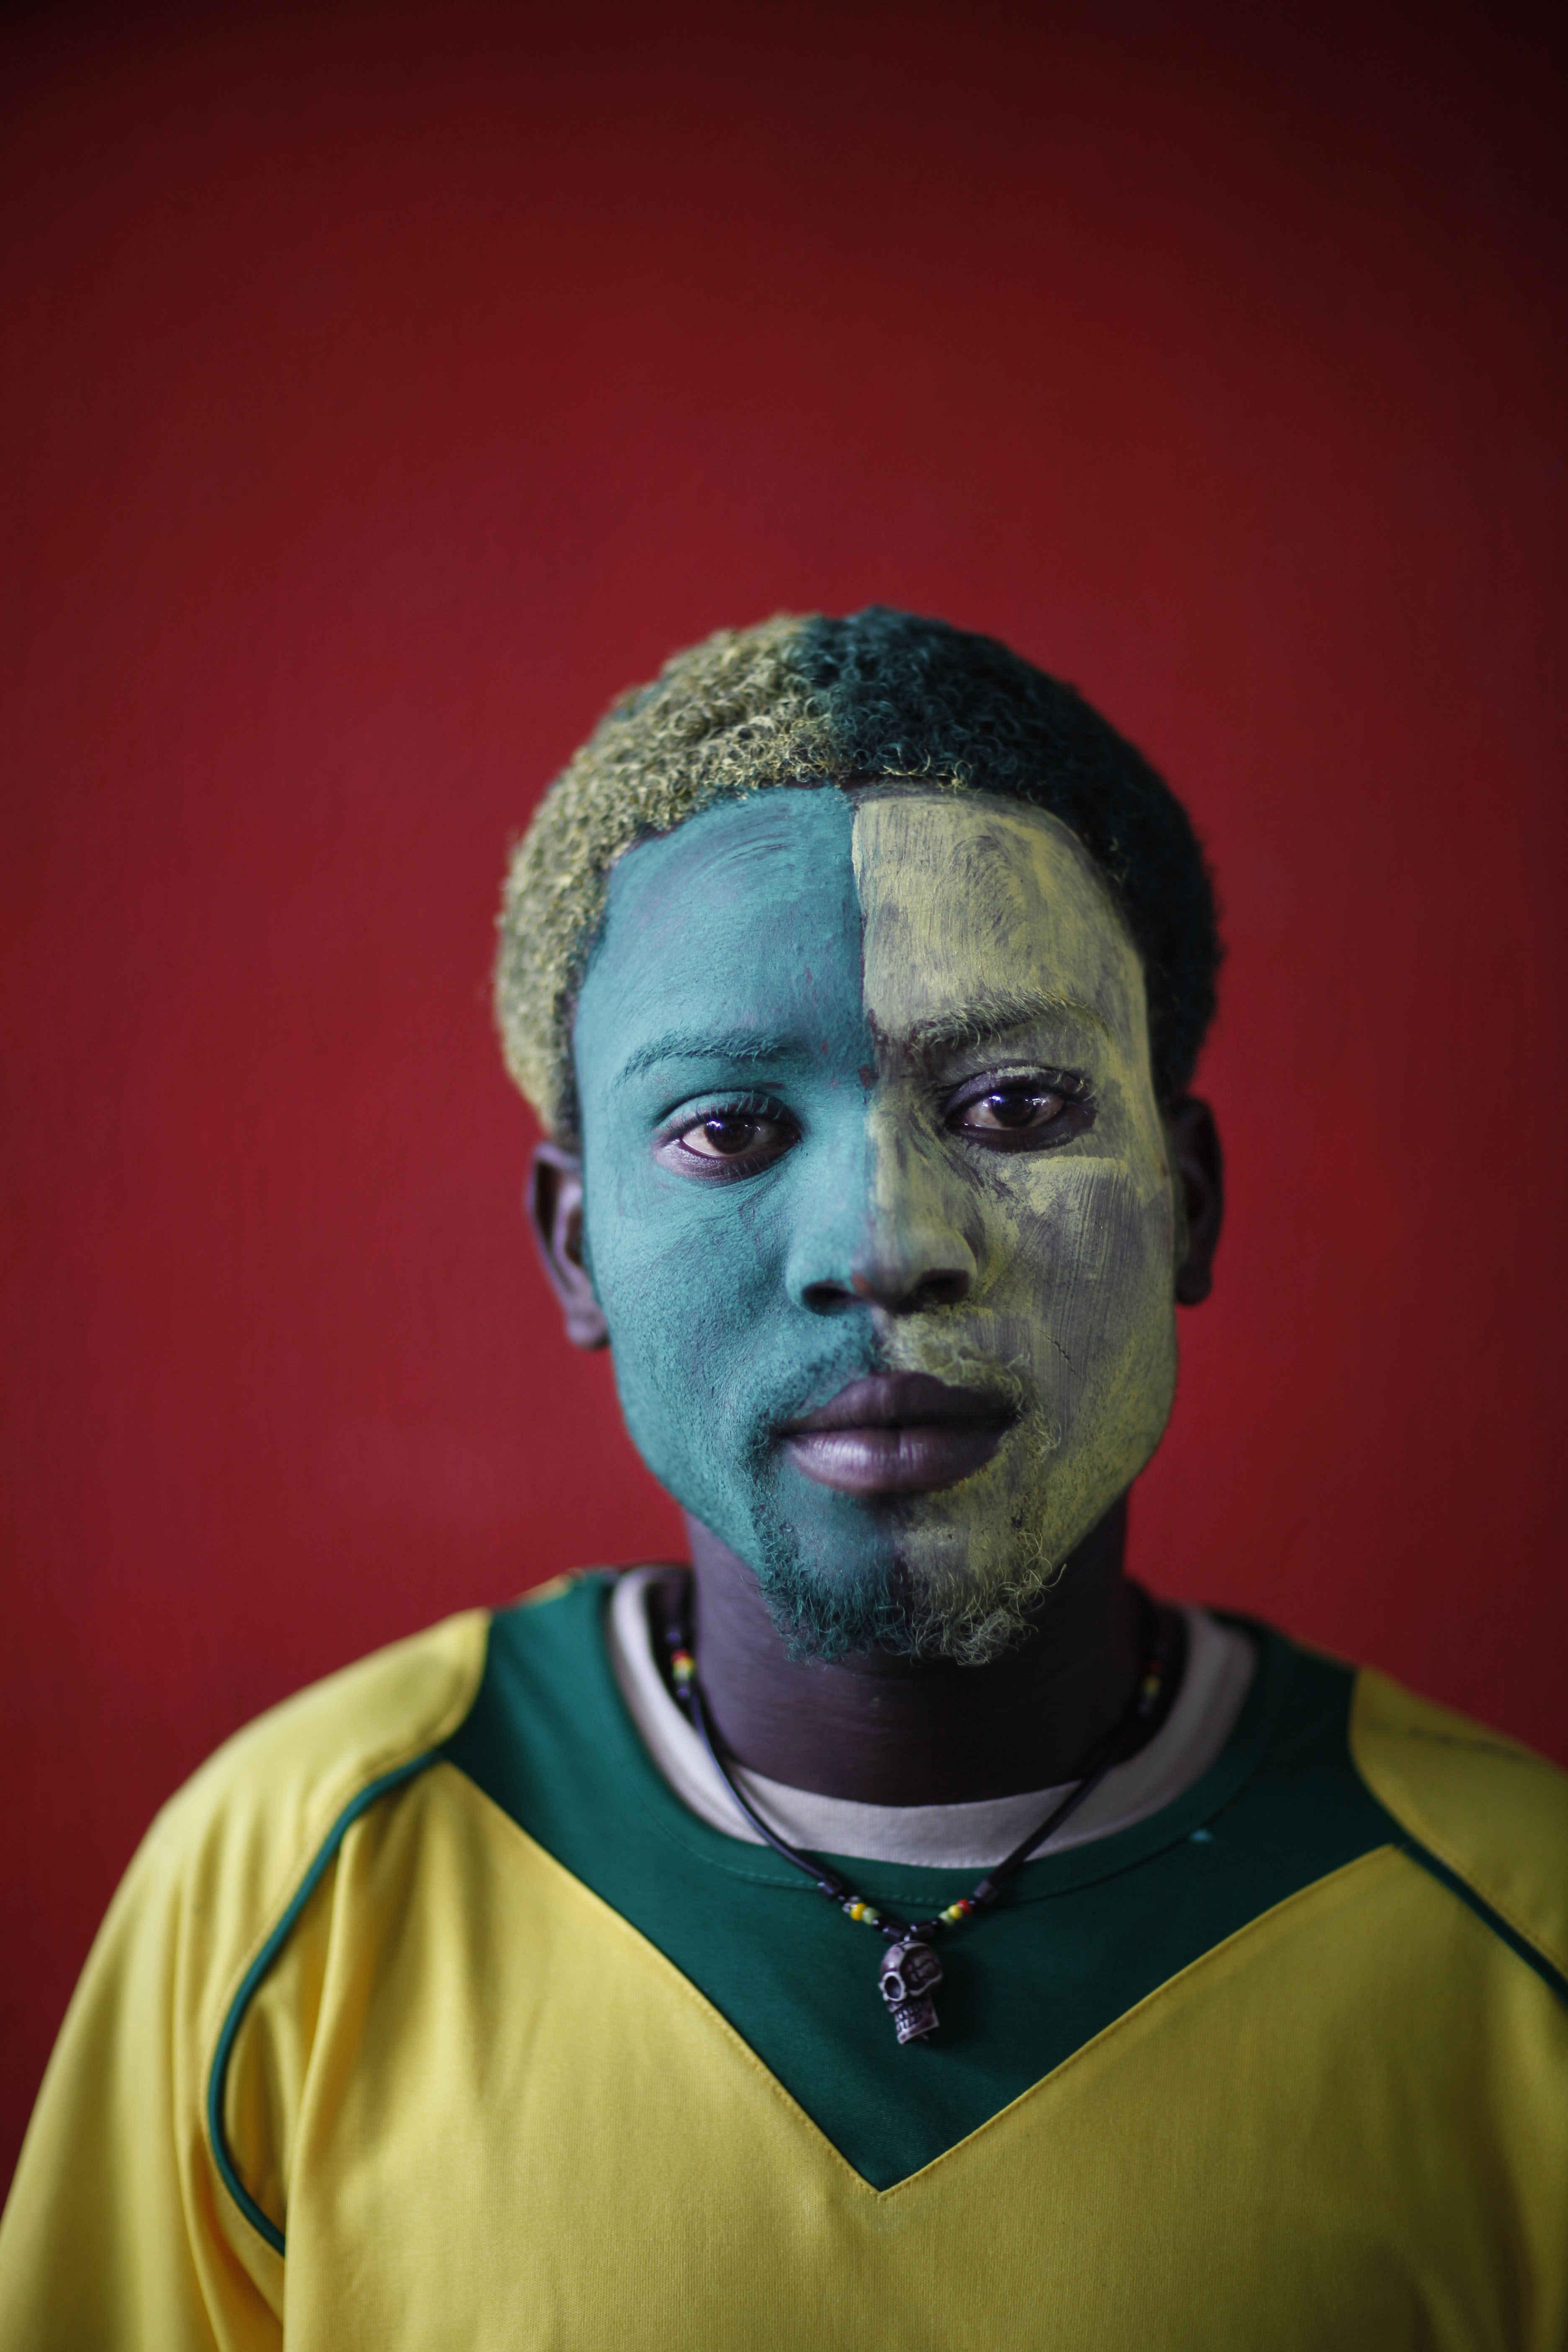 Haiti's Soccer Fans - series